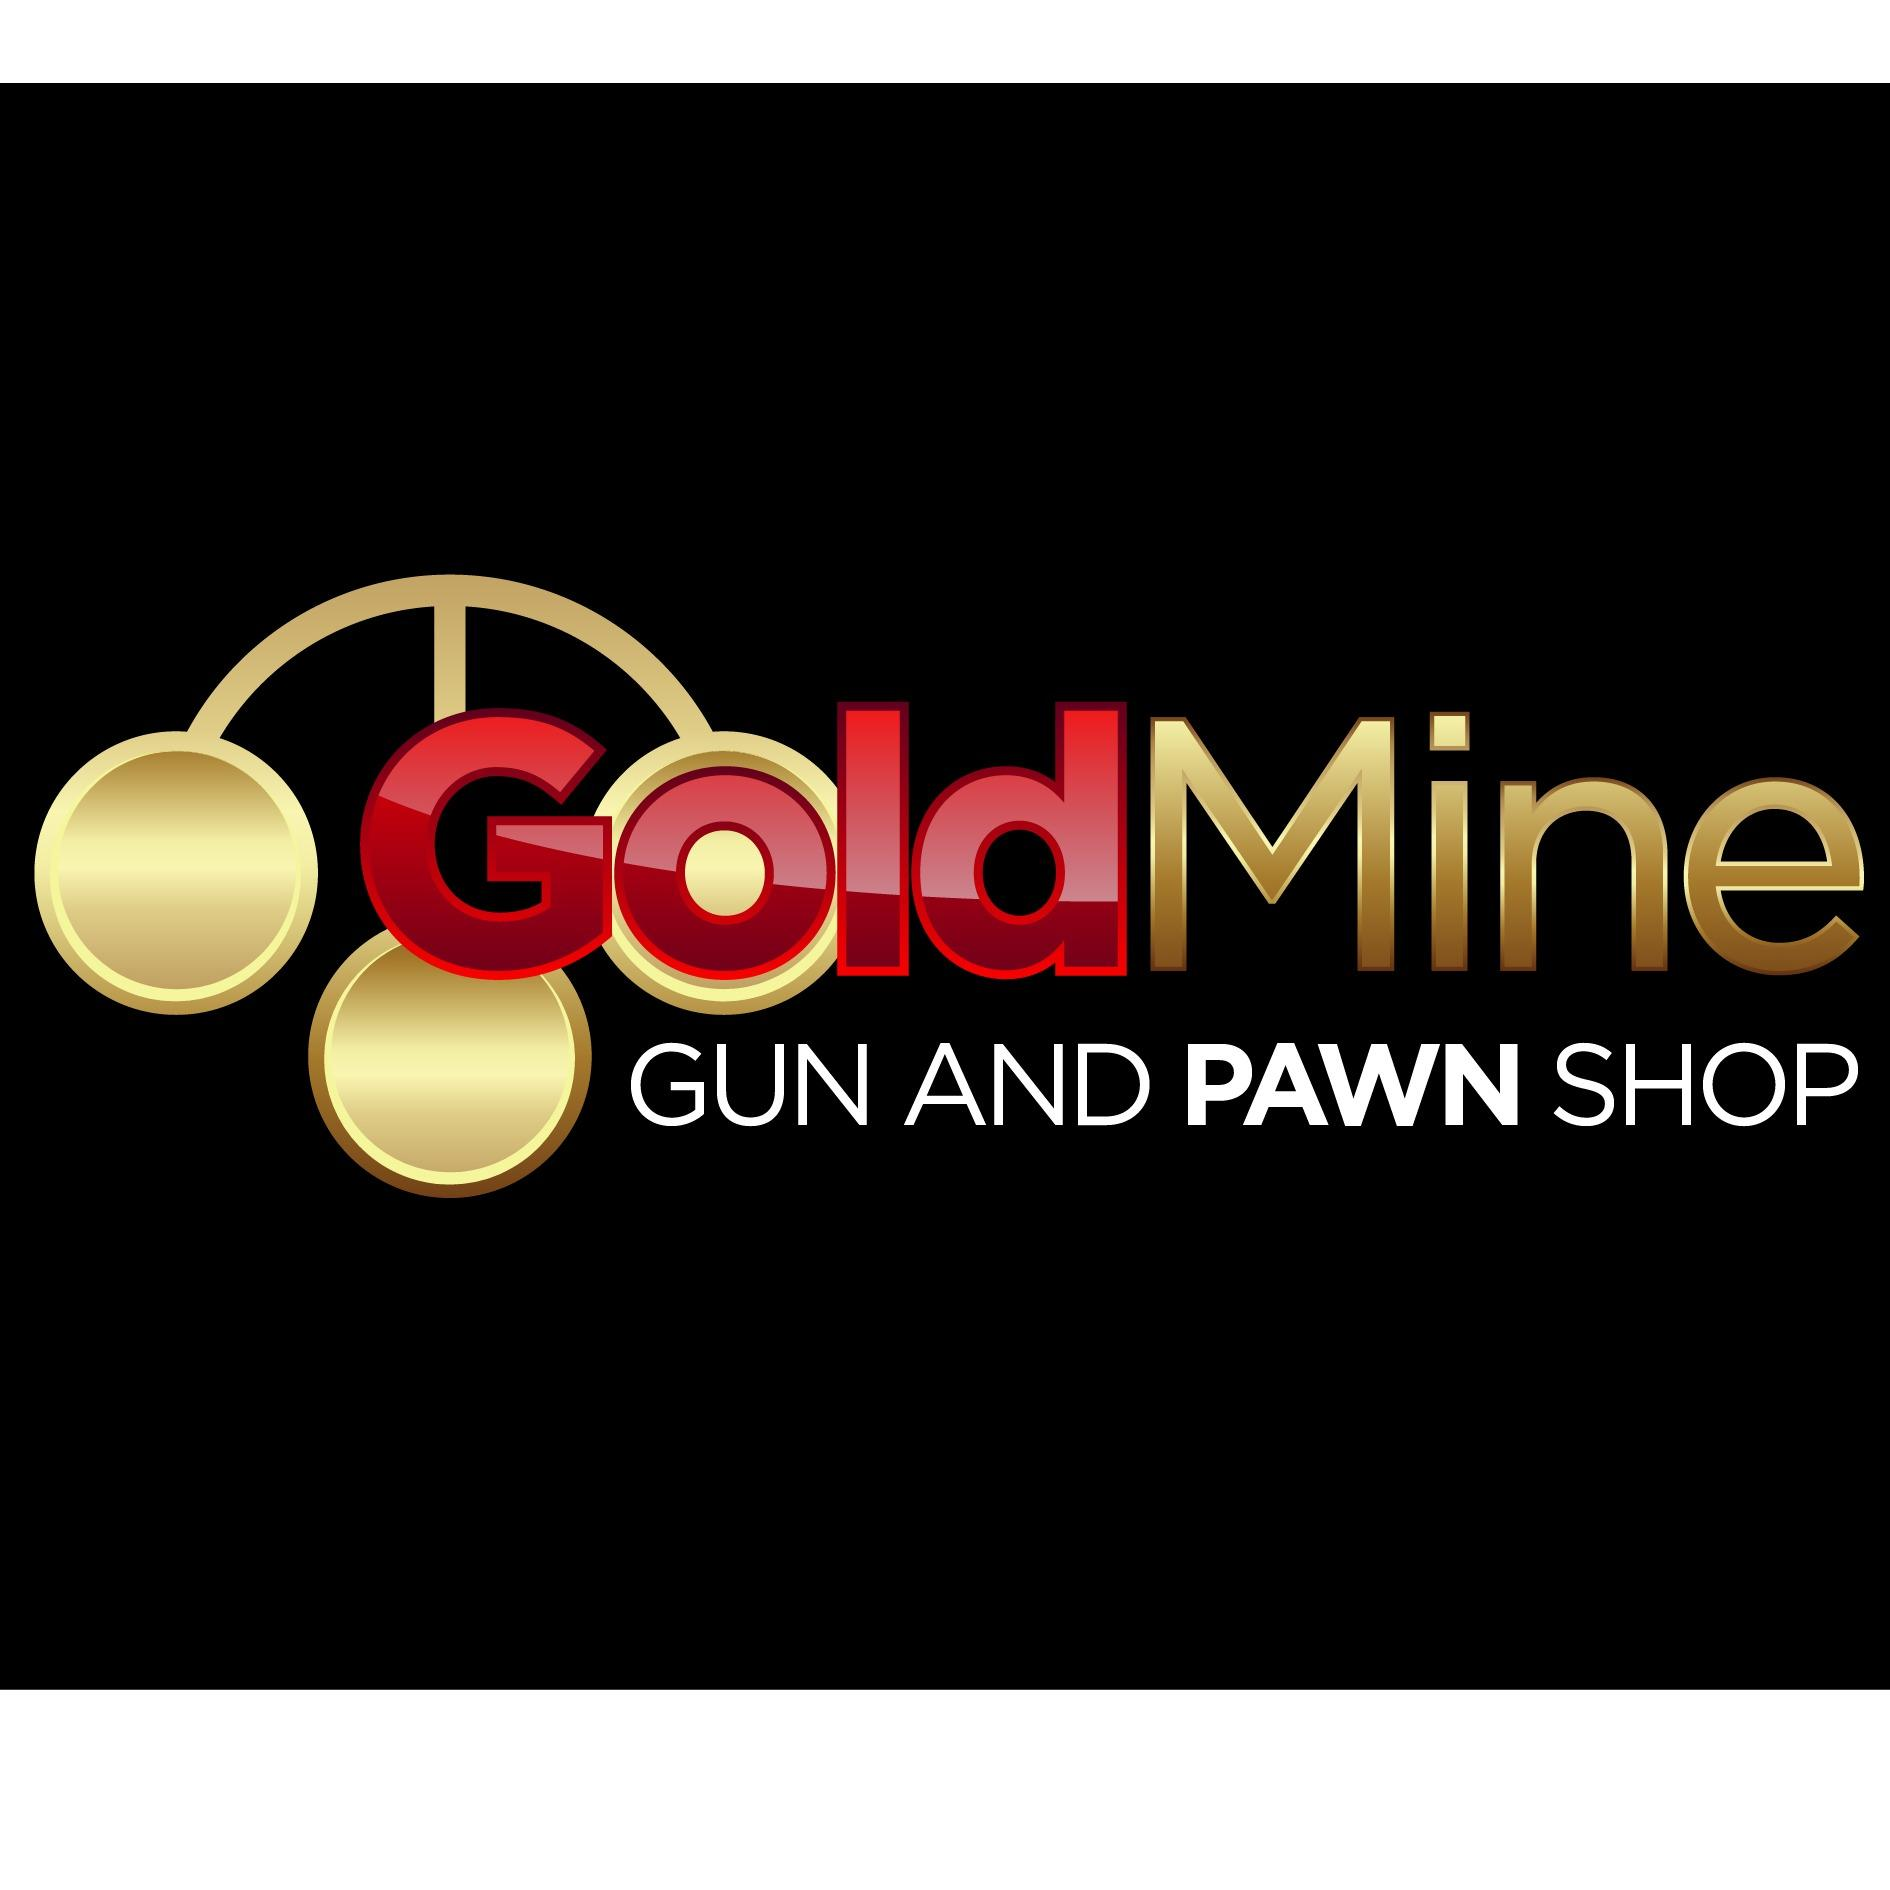 Goldmine Gun & Pawn